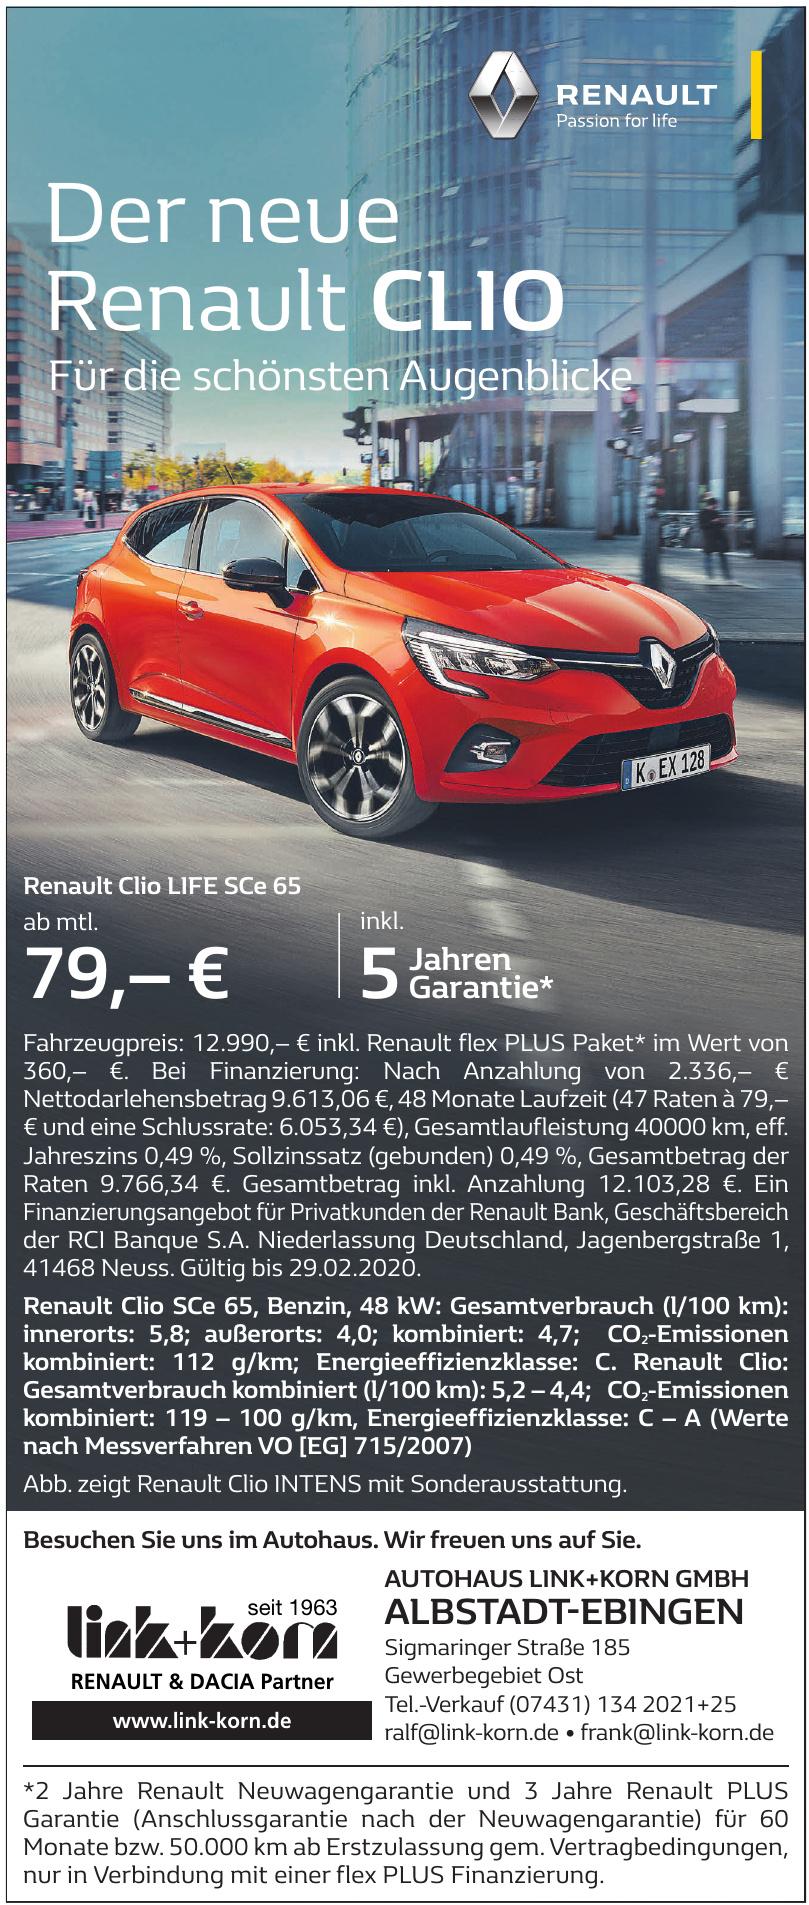 Autohaus Link+Korn GmbH